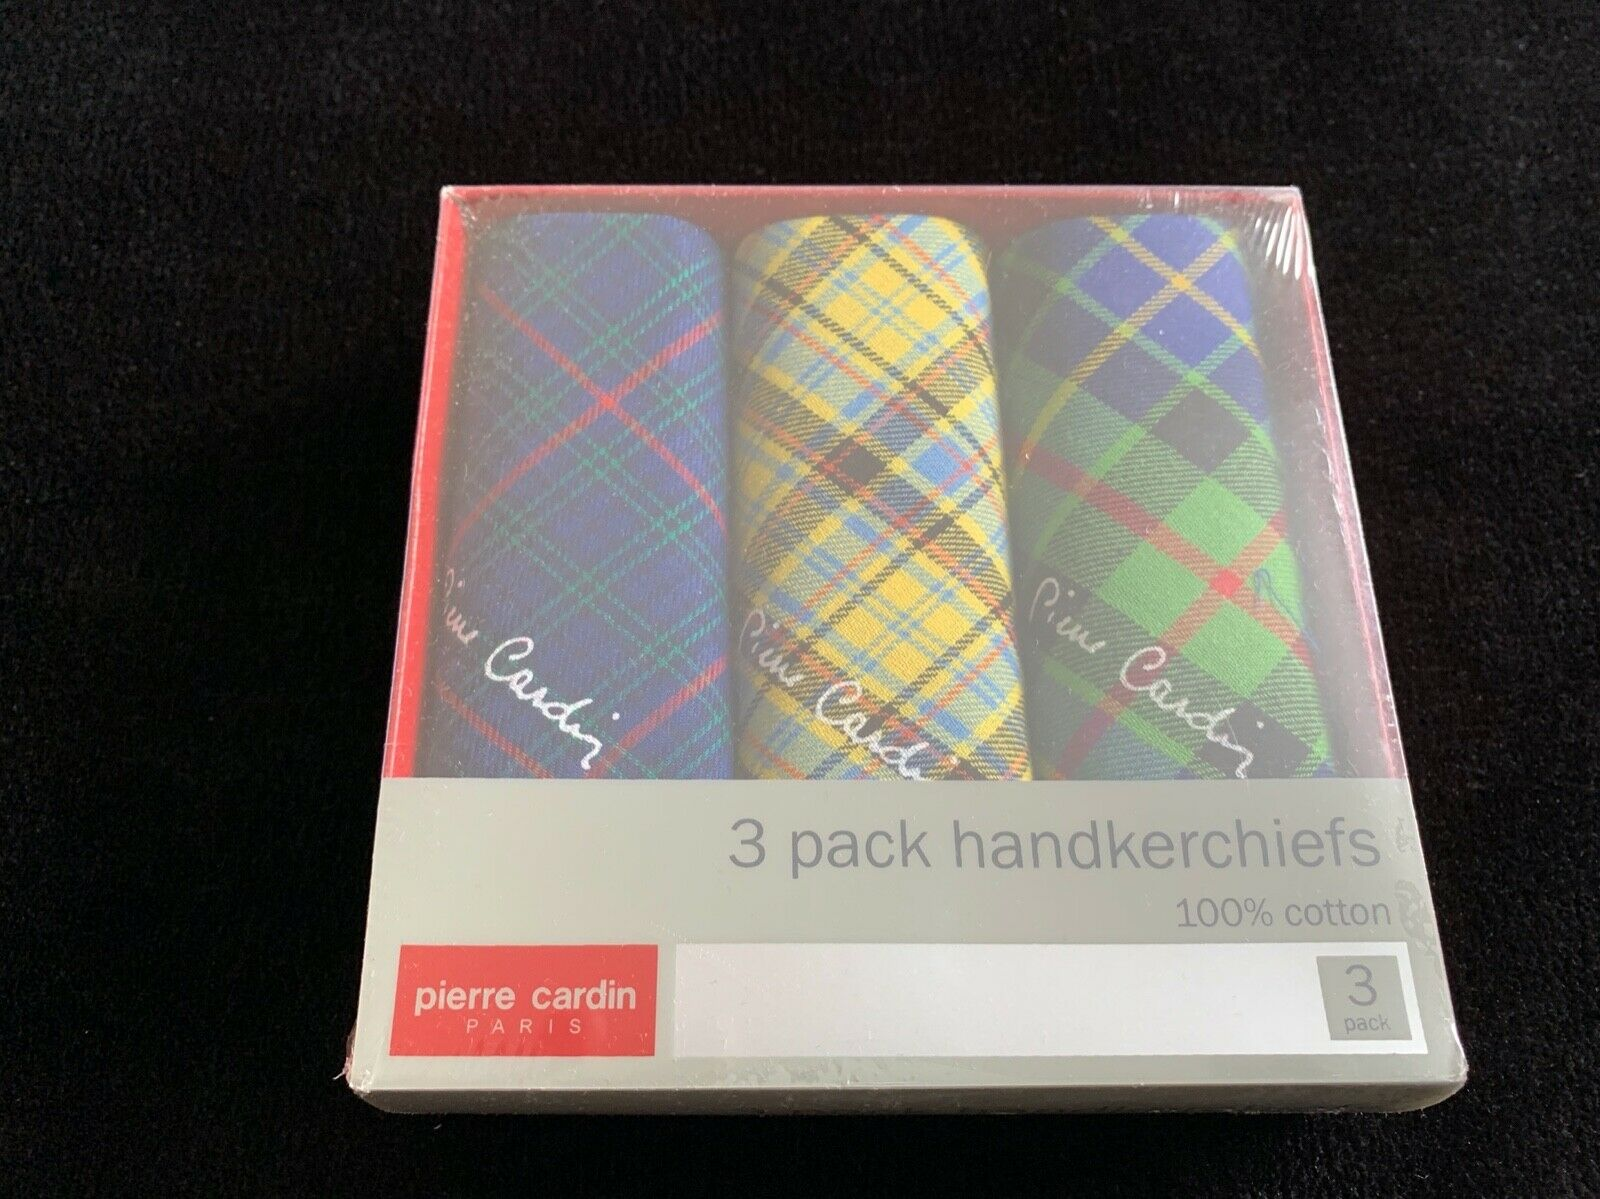 Pierre Cardin Paris Vintage 15 year old handkerchief New In Box. Classic 3pcs.